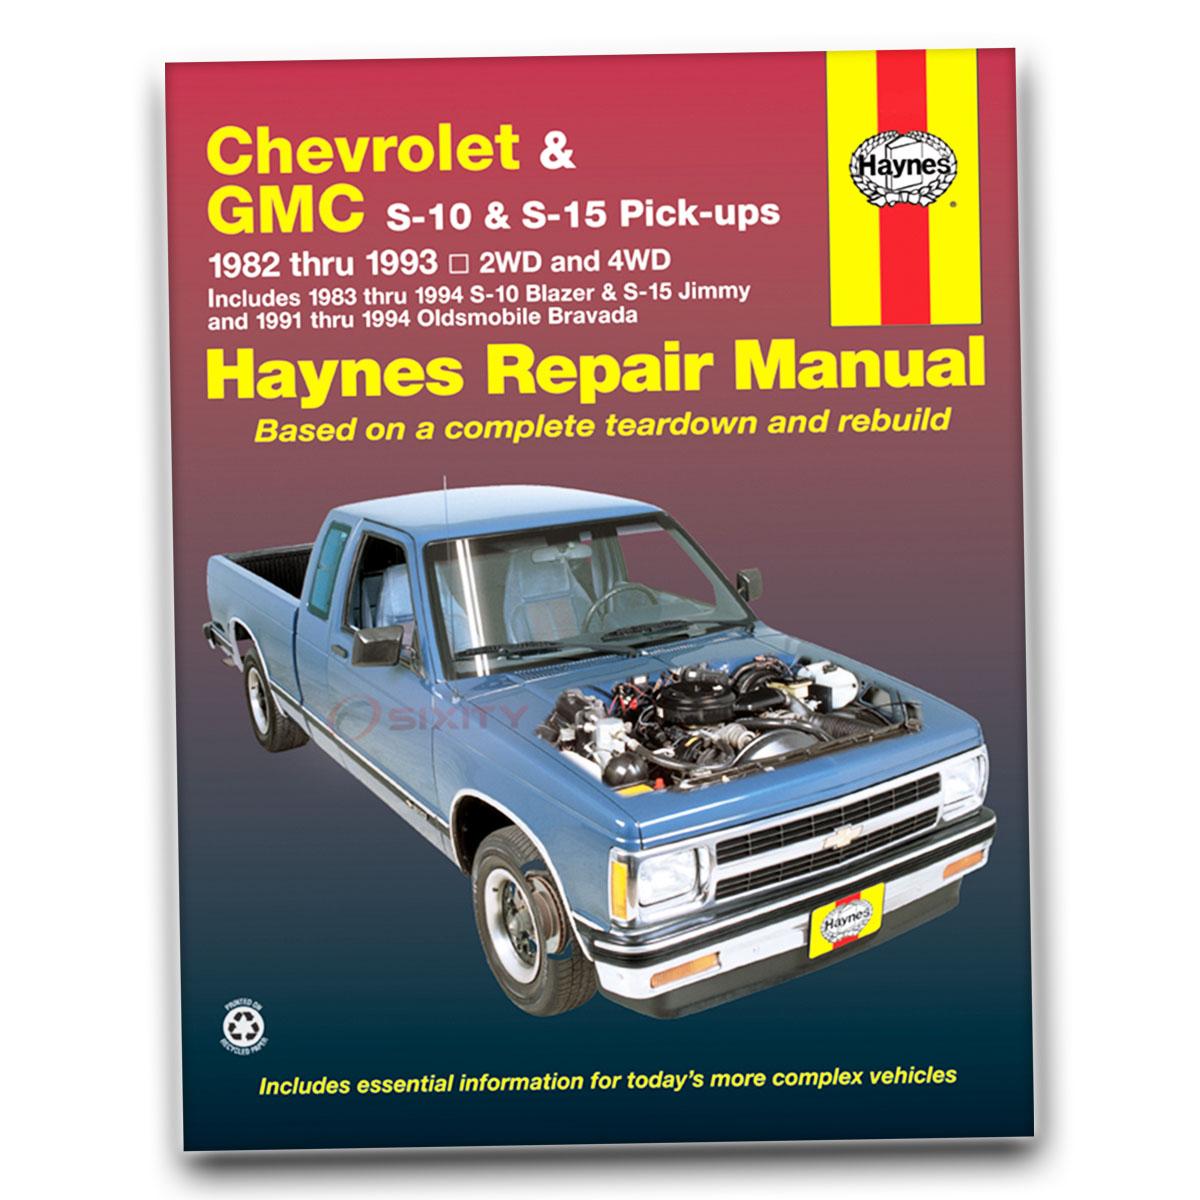 Chevy S10 Haynes Repair Manual Tahoe Baja El Sport Base